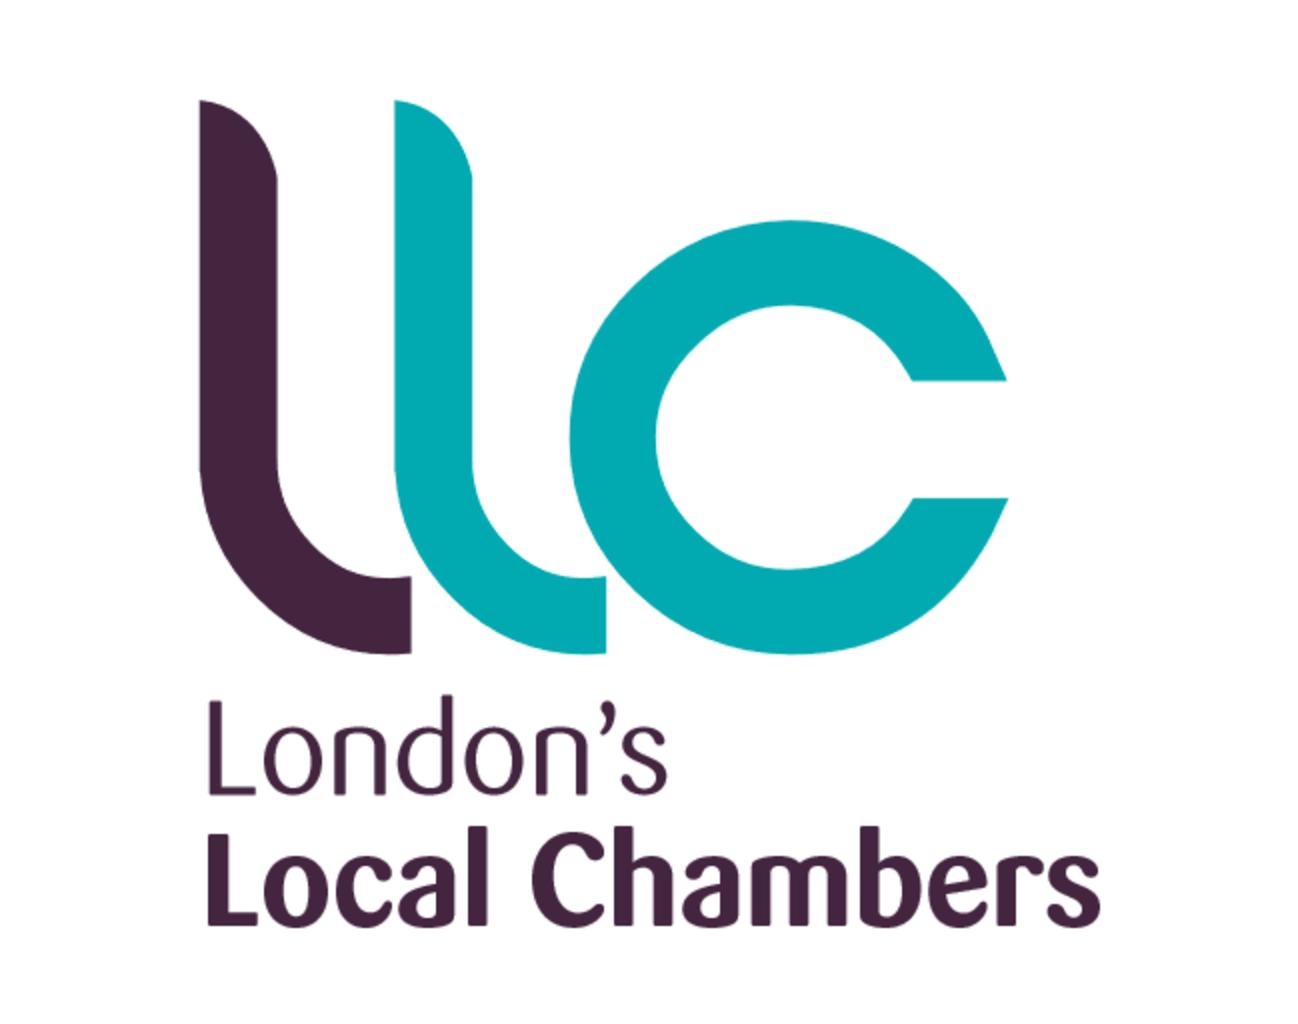 LondonChamber